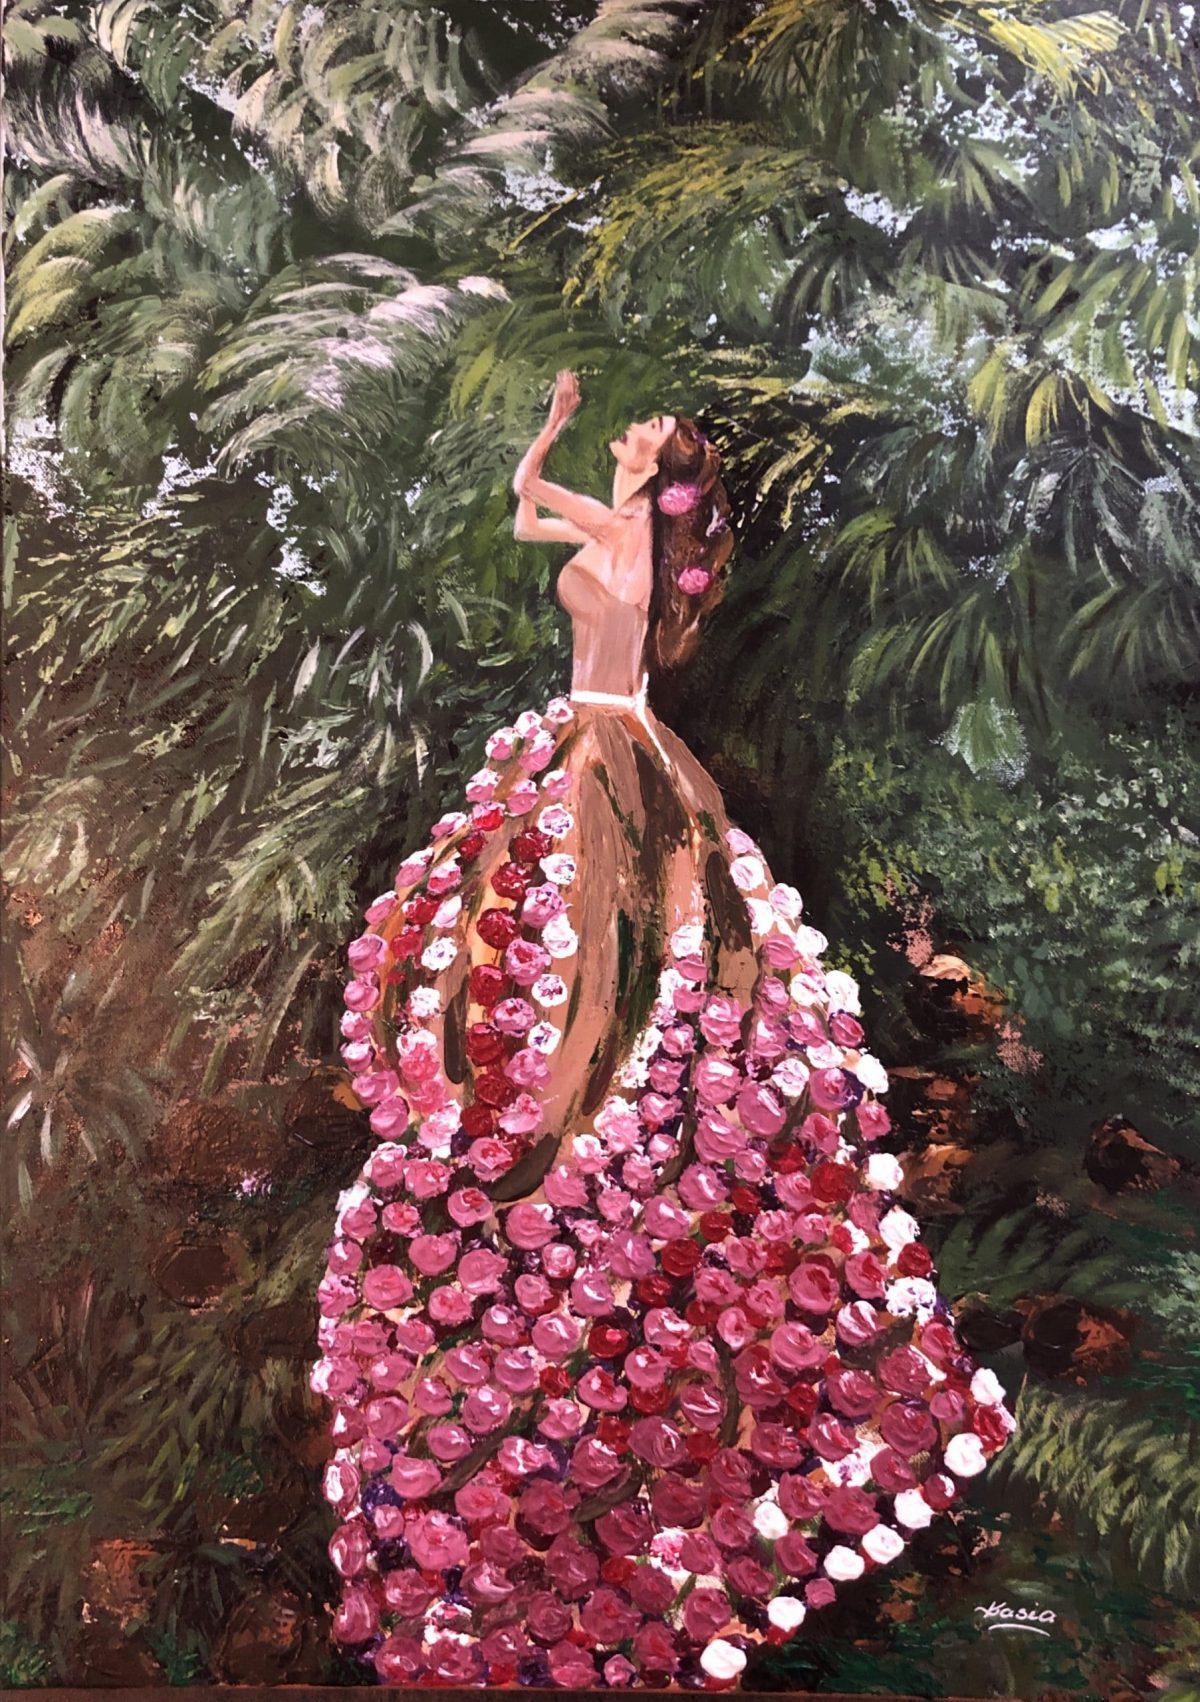 "Une femme fleuri au jardin tropical"" signé Kasia, Kate_Art de l'artiste Katarzyna Boduch"